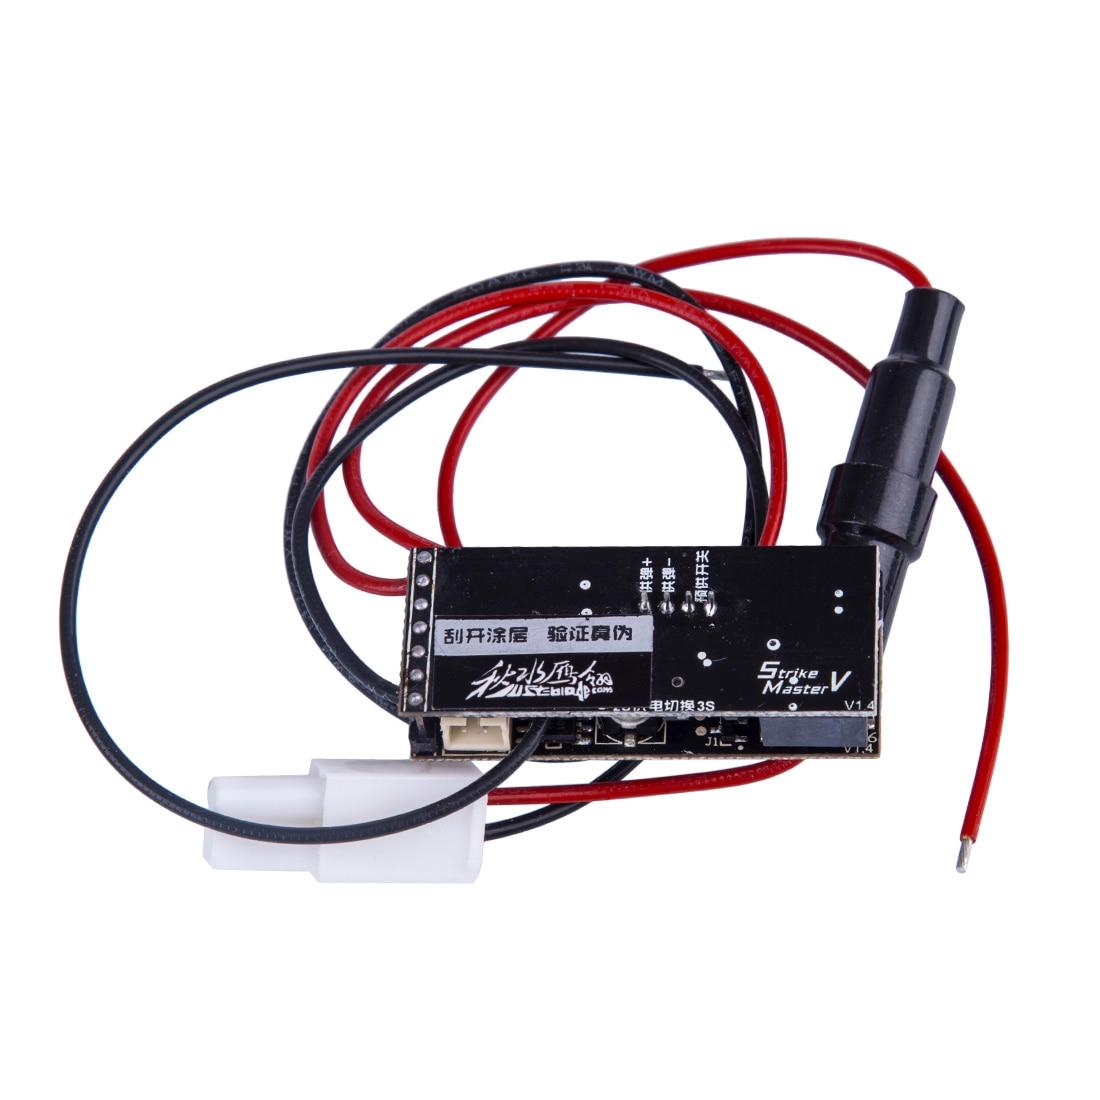 MODIKER StrikeMaster V Electronic Fire Control Unit Module Chip For LH Sword Gen.2 Water Gel Beads Blaster